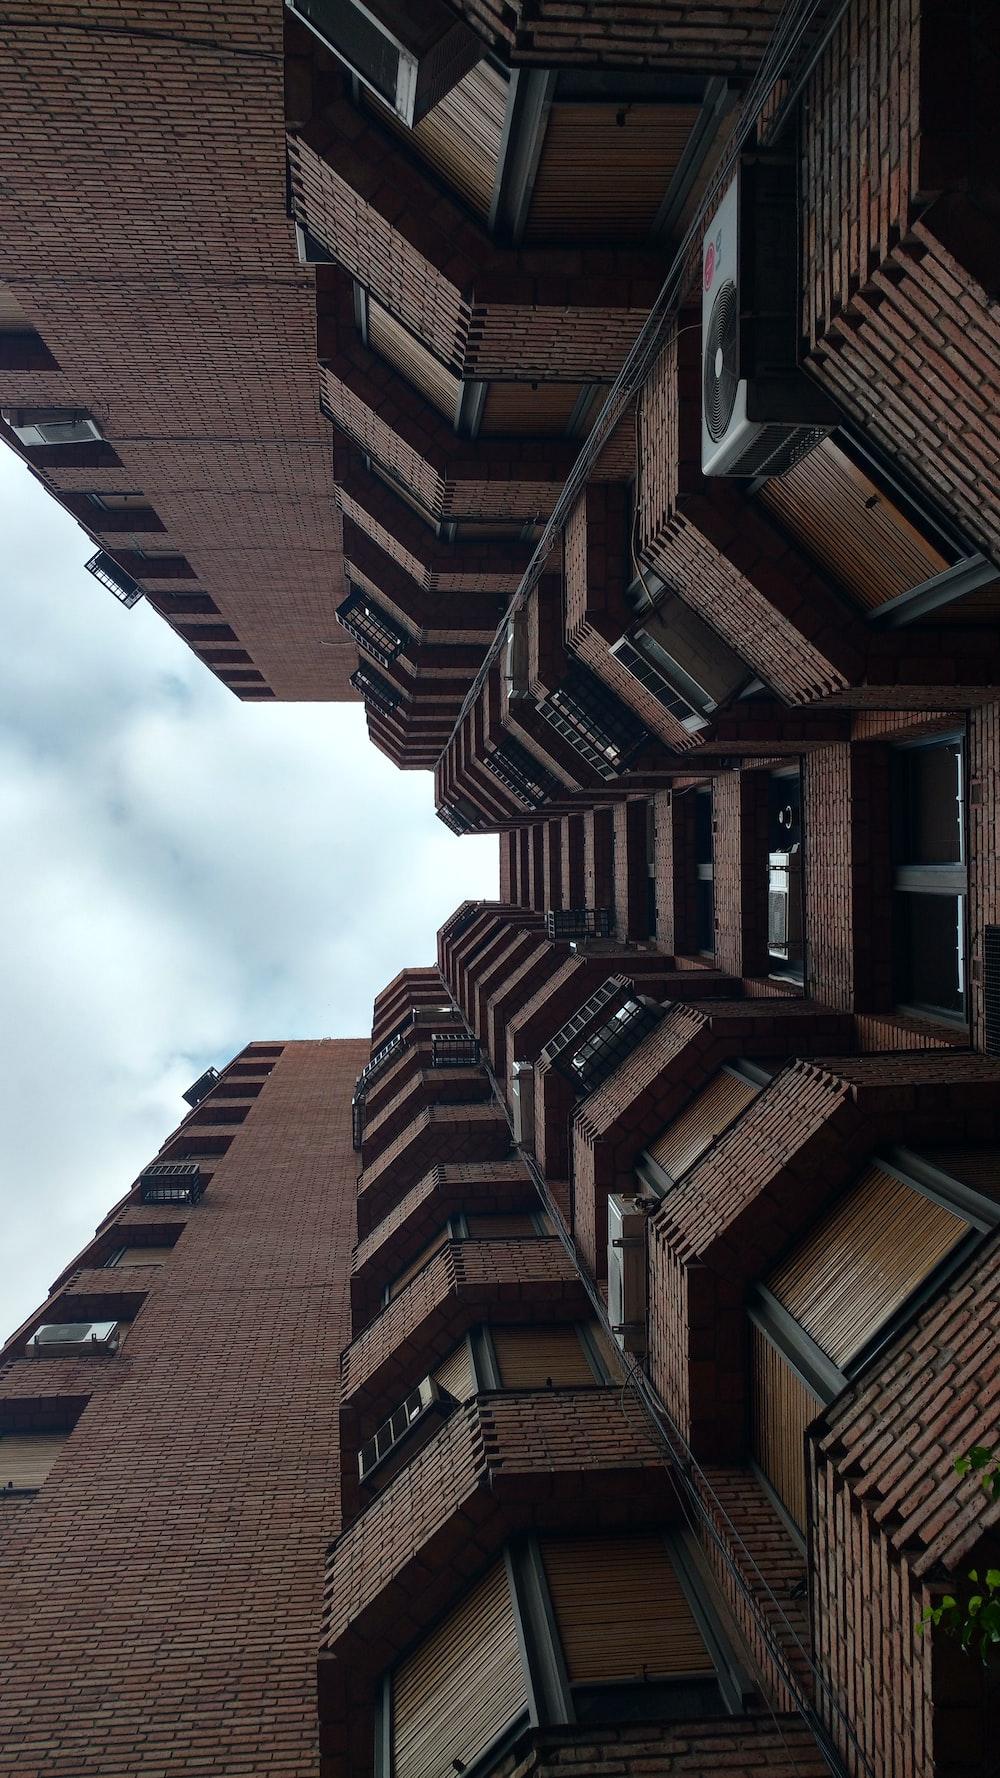 worm's eye view of brick buildings